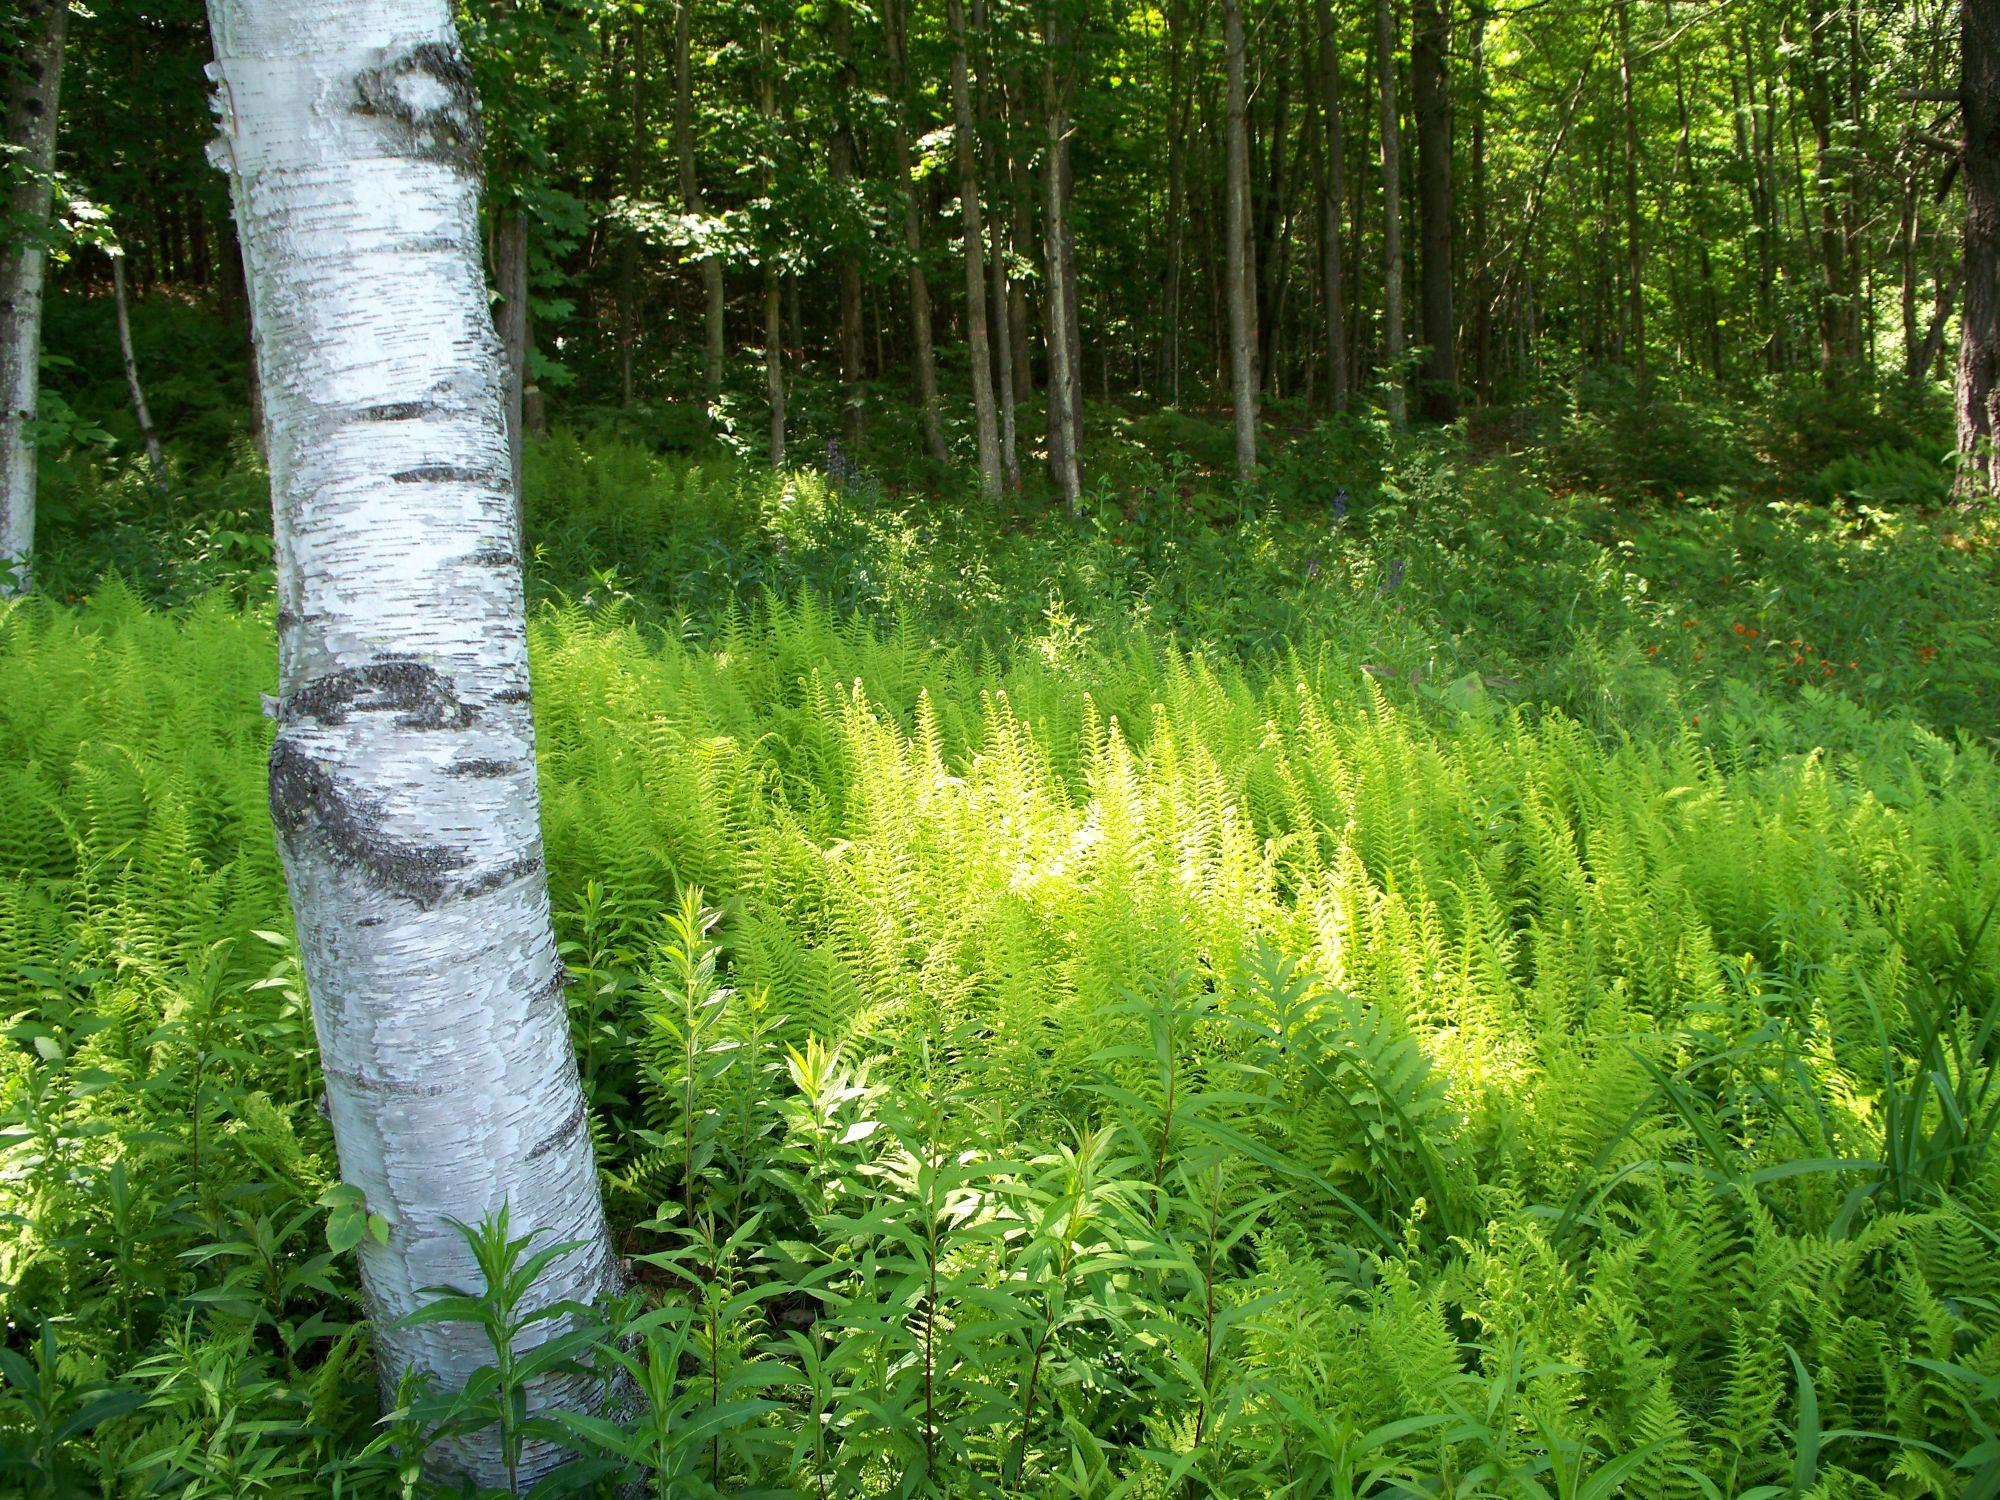 Sun in the ferns